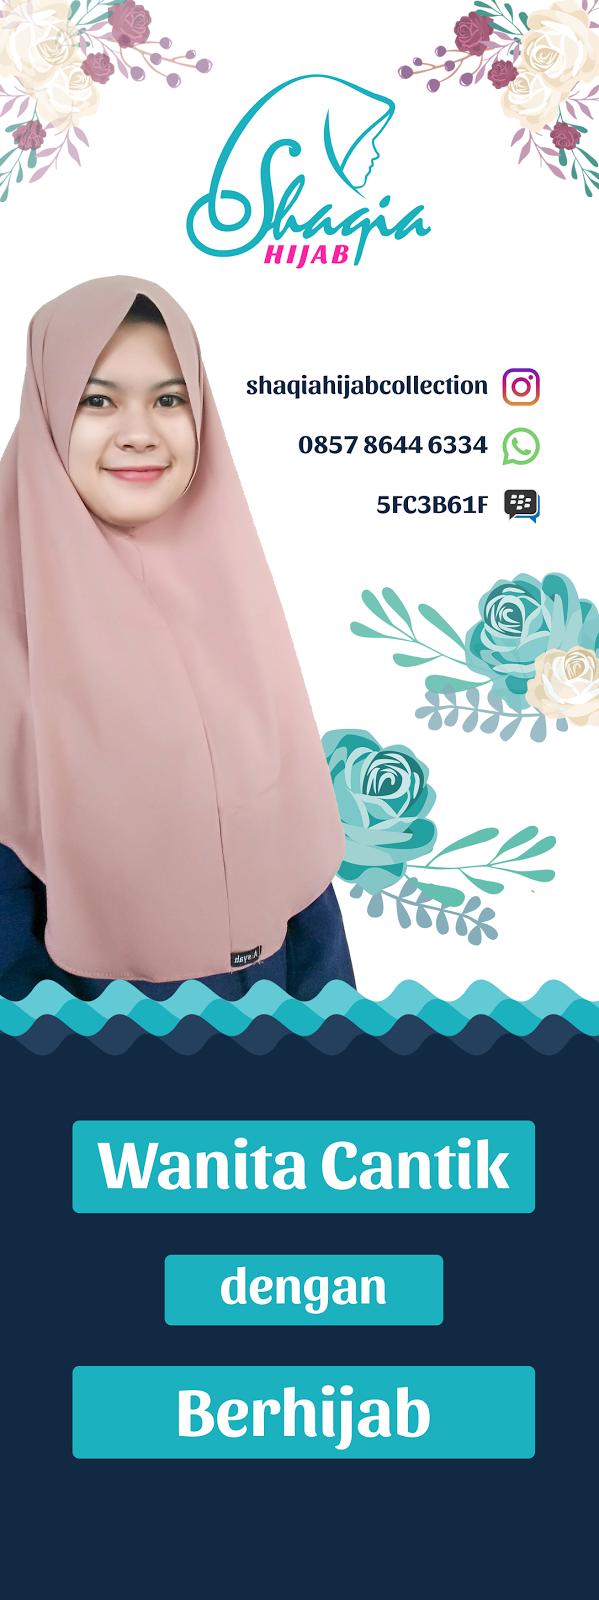 Desain Stand Banner Hijab - Desain Grafis Kreatif